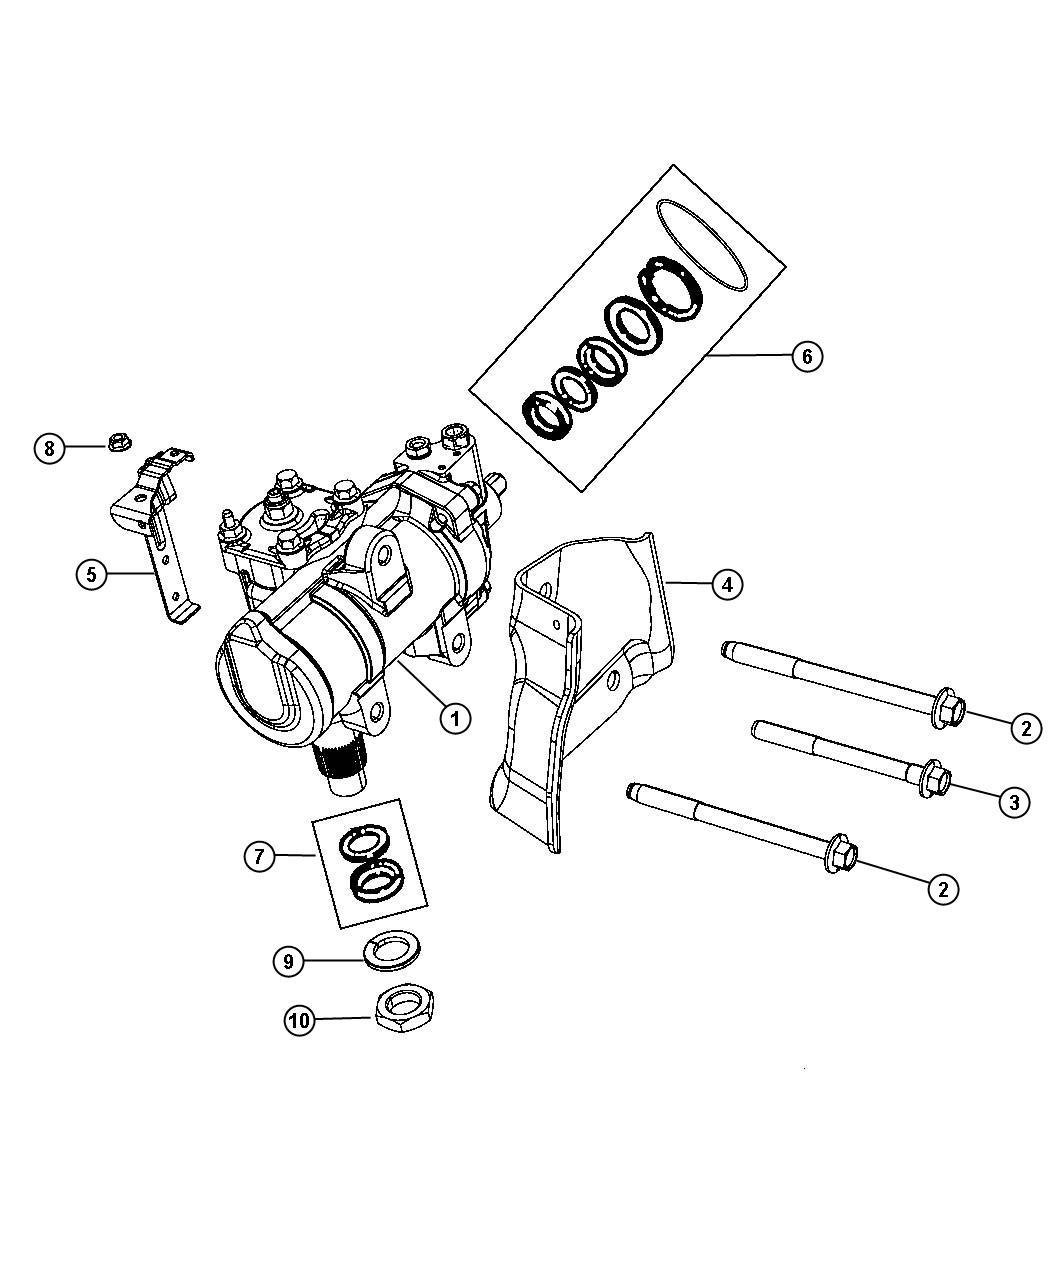 i2282054 Ram Wiring Diagram on